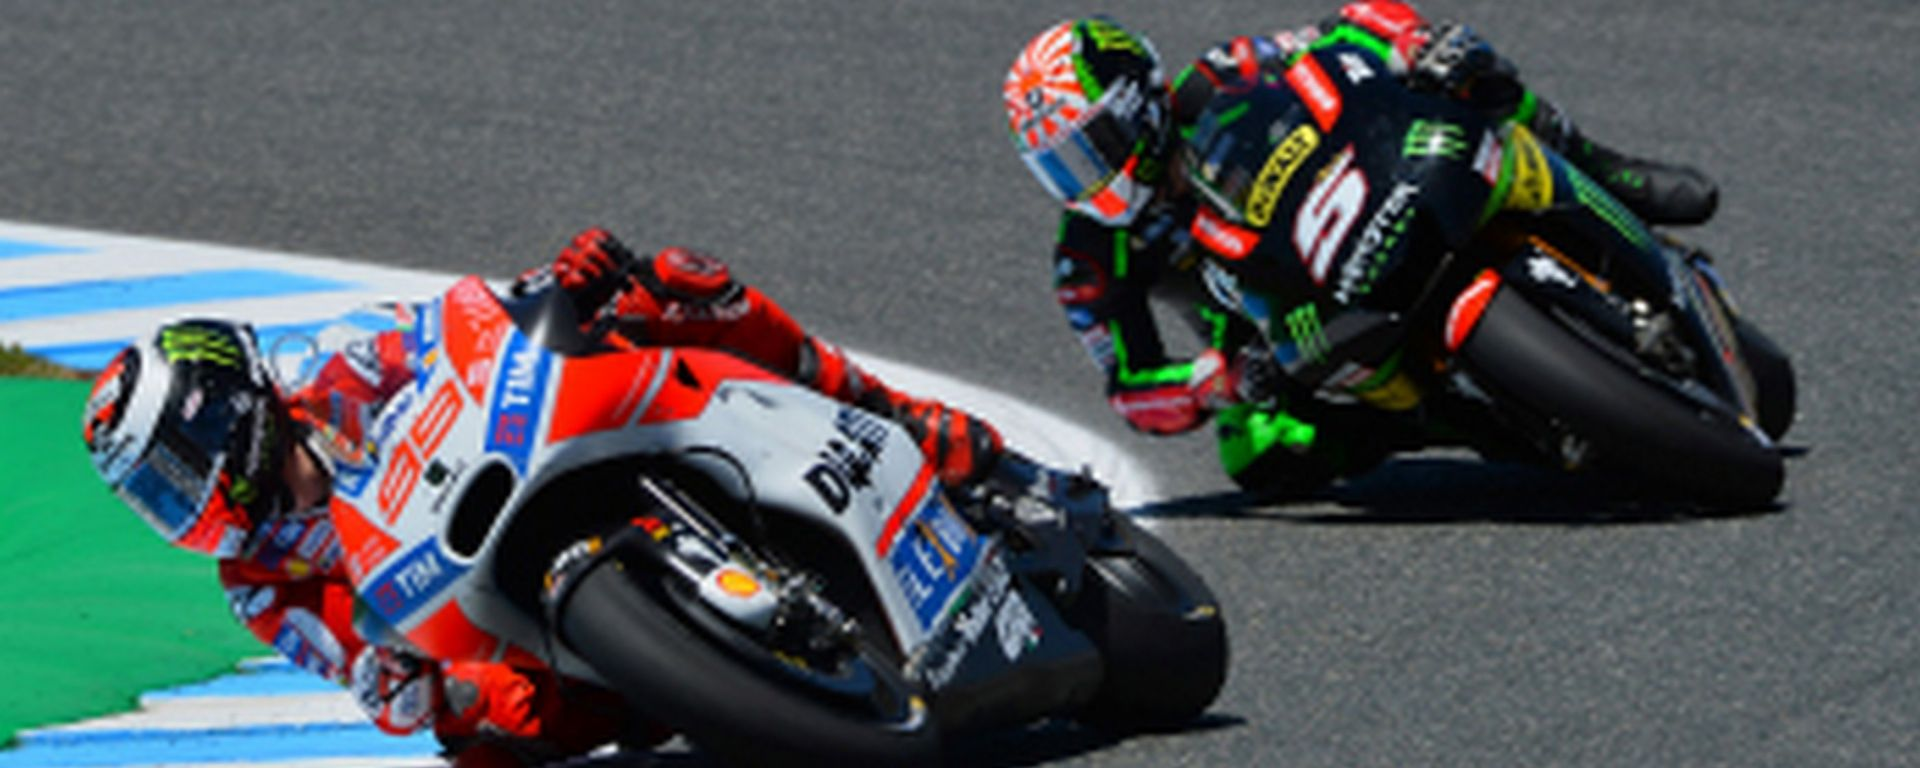 Shark Race-R Pro: Jorge Lorenzo ci porta a vedere come nasce il casco da MotoGP